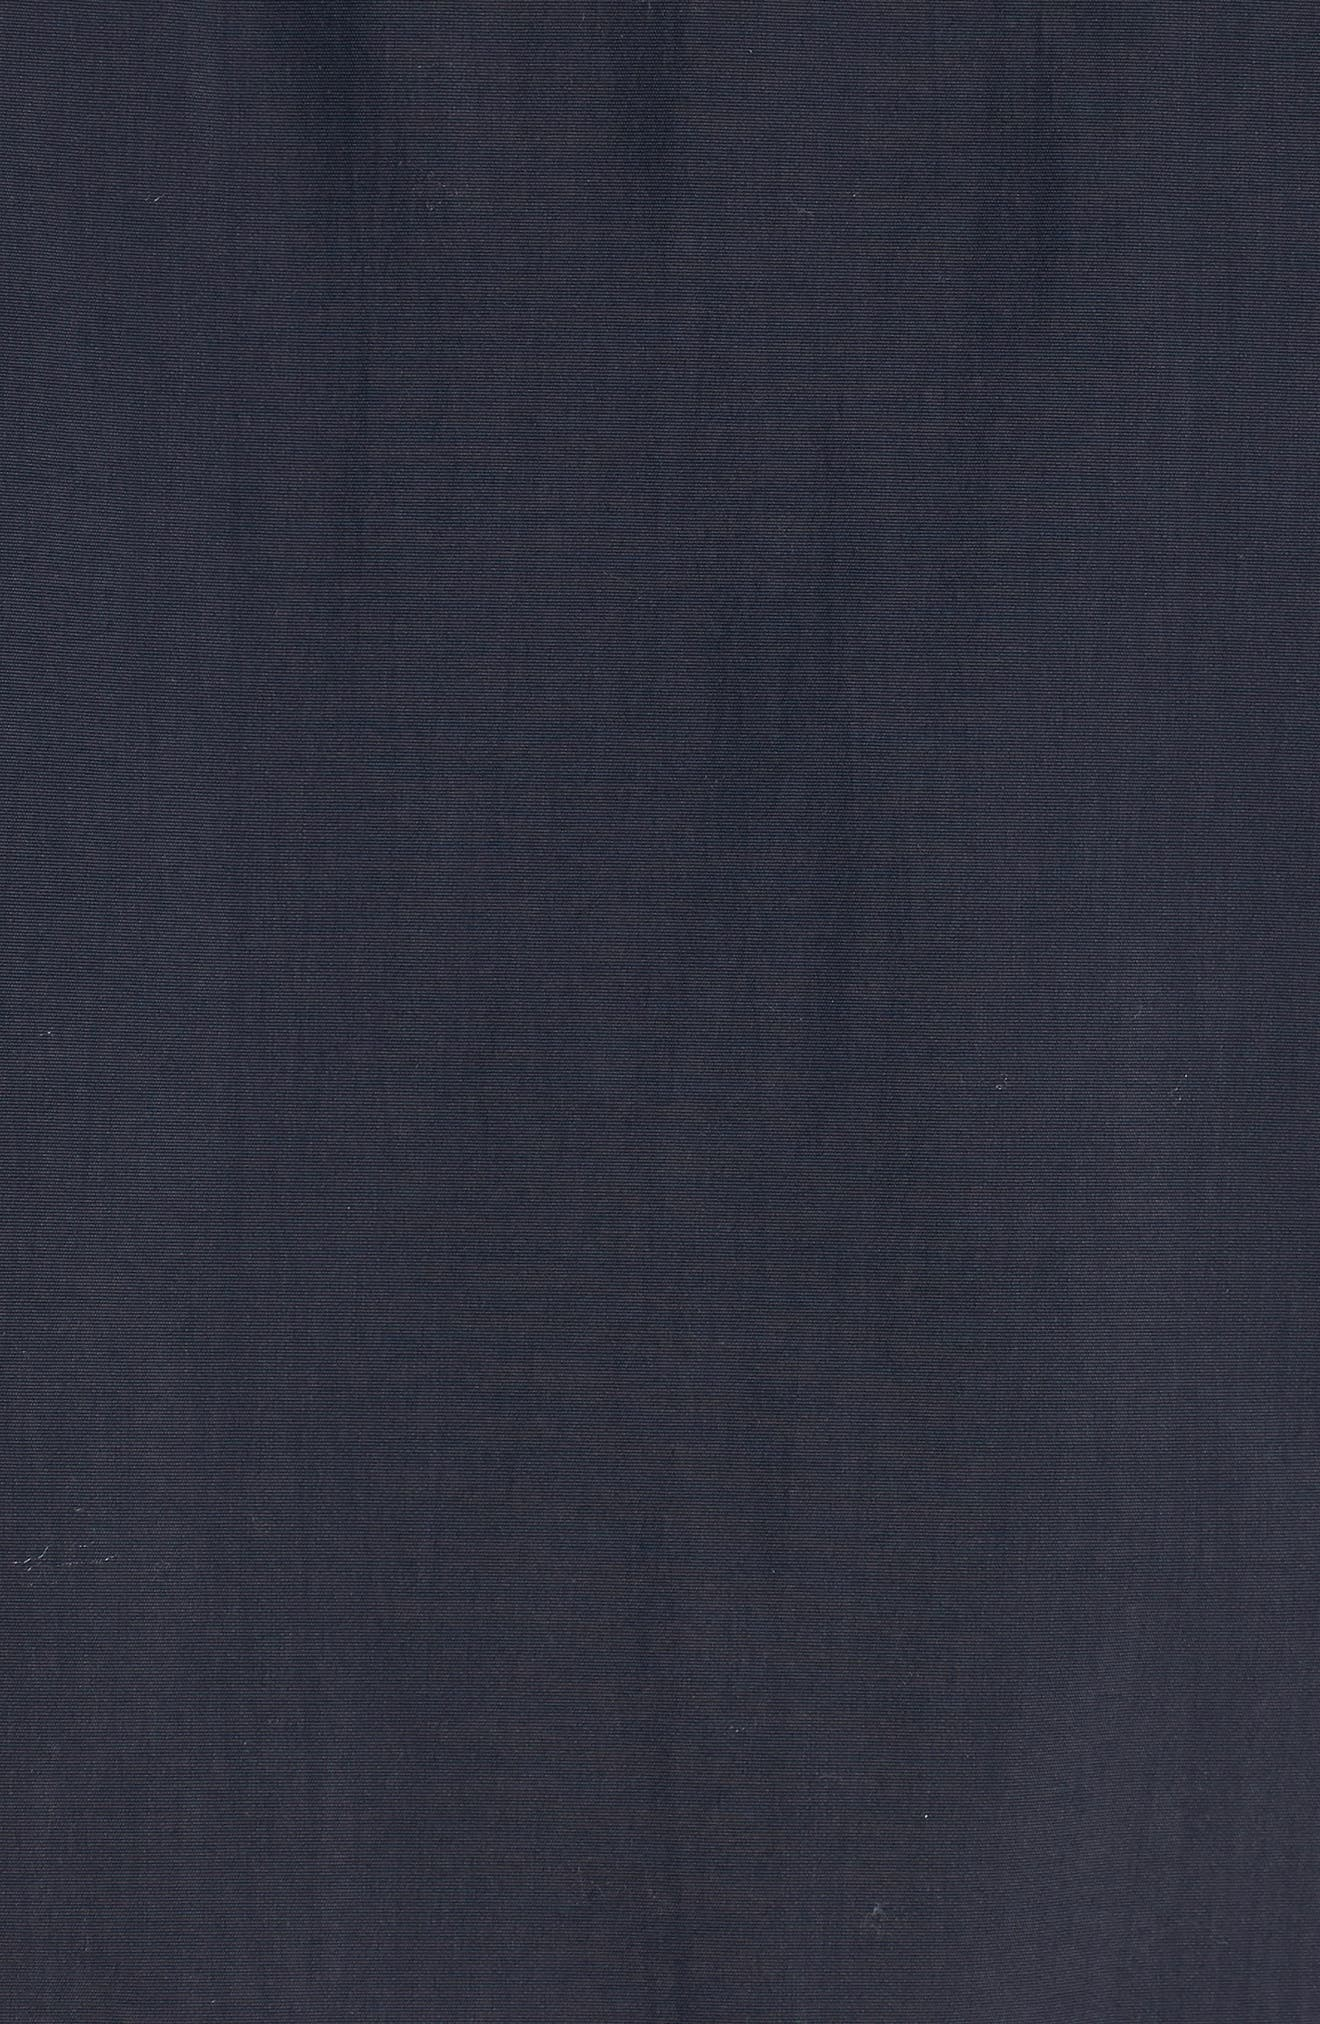 BARBOUR, Tiree Waterproof Jacket, Alternate thumbnail 6, color, 410